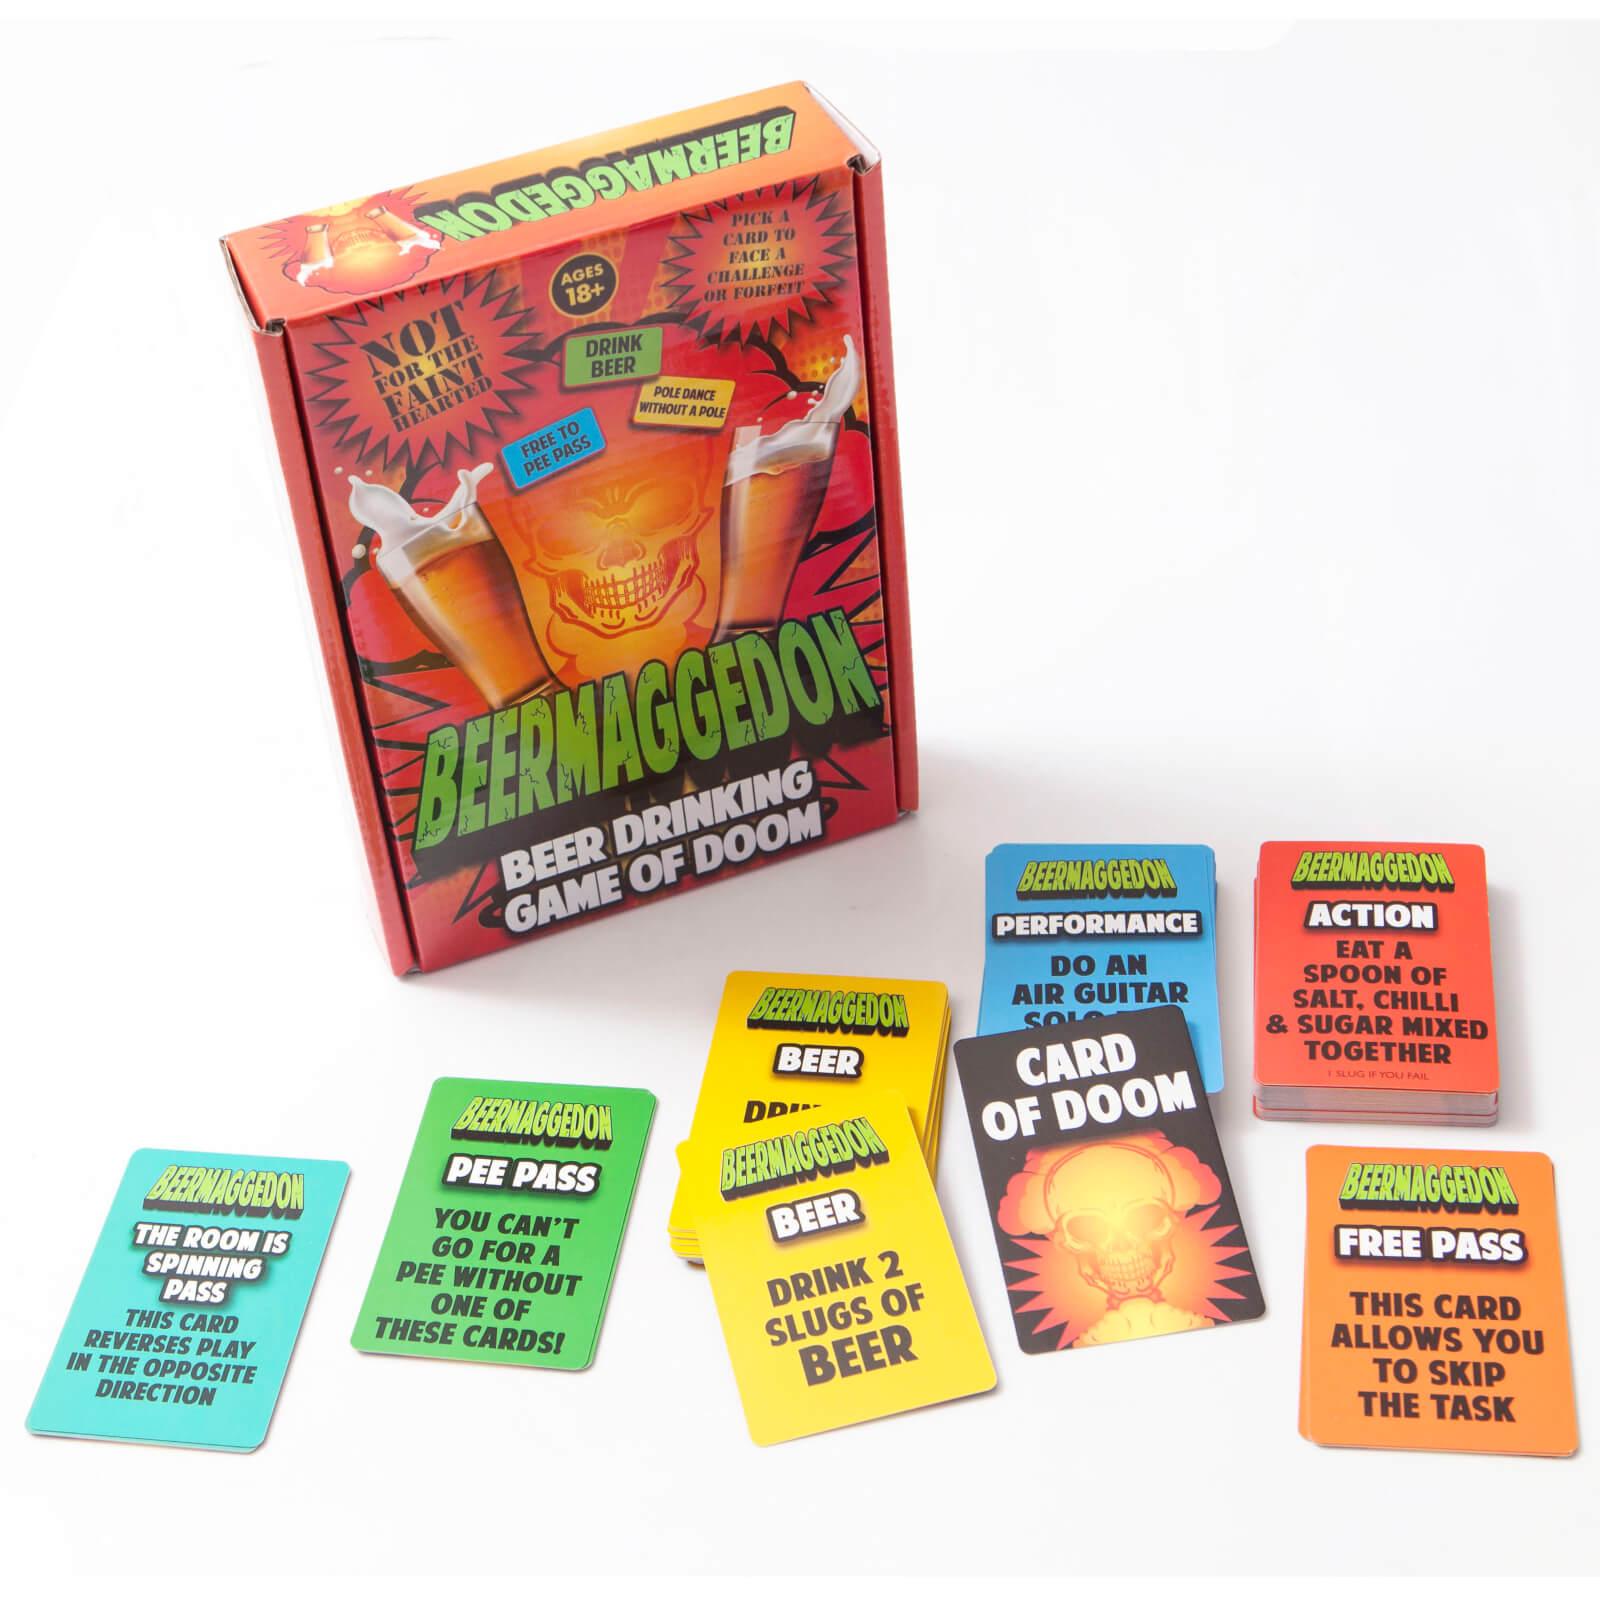 Image of Beermaggedon Game